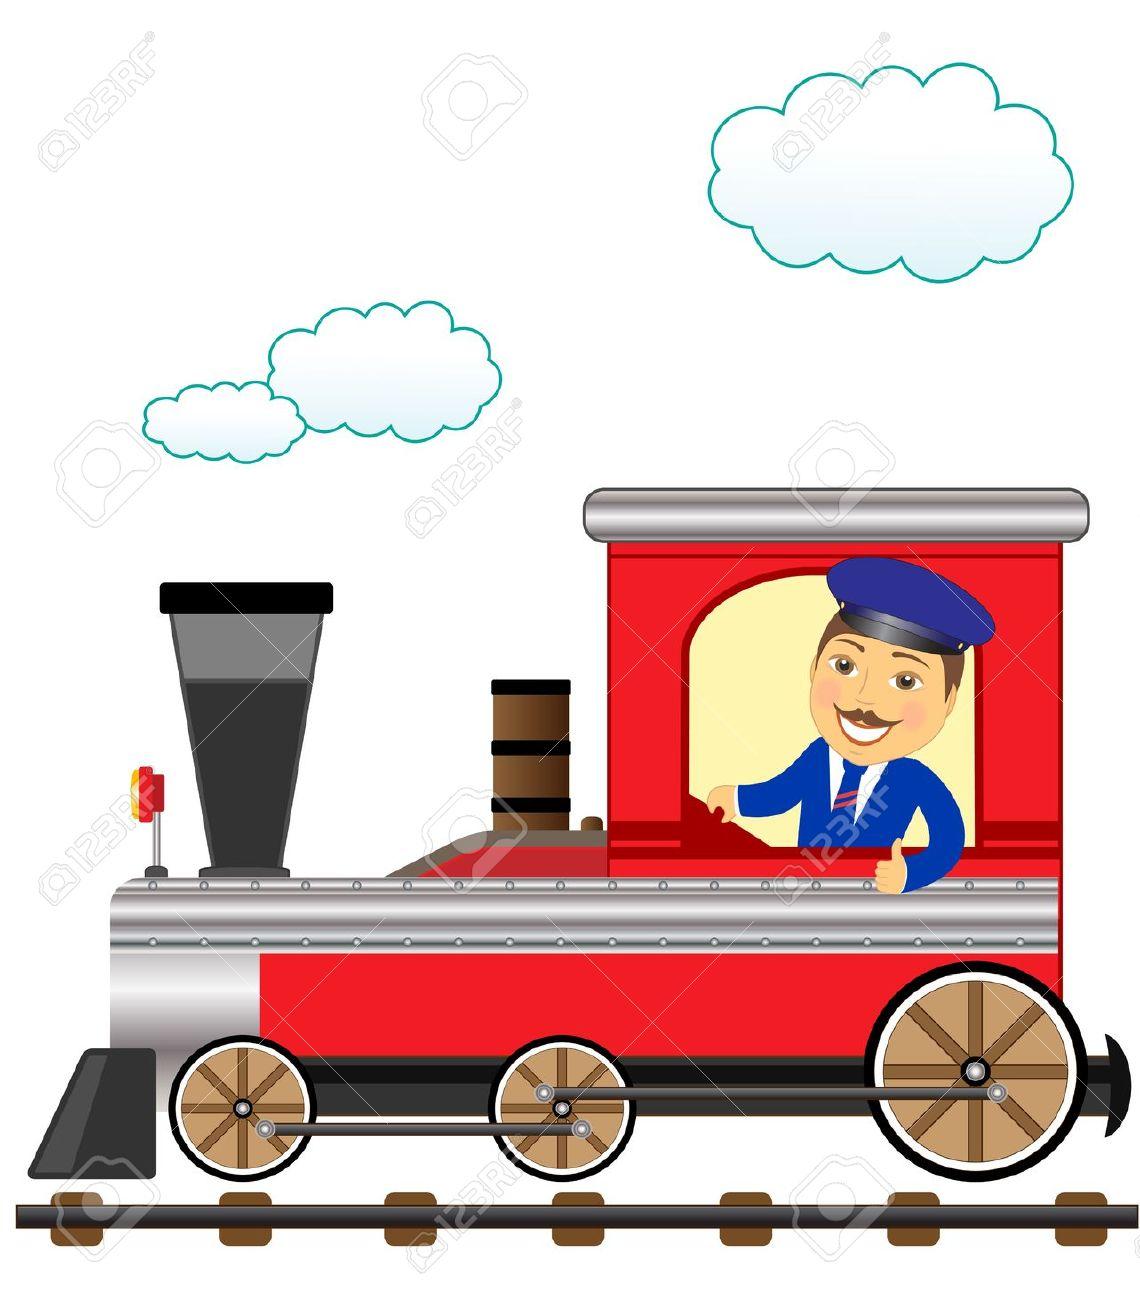 train conductor: cheerful .-train conductor: cheerful .-5